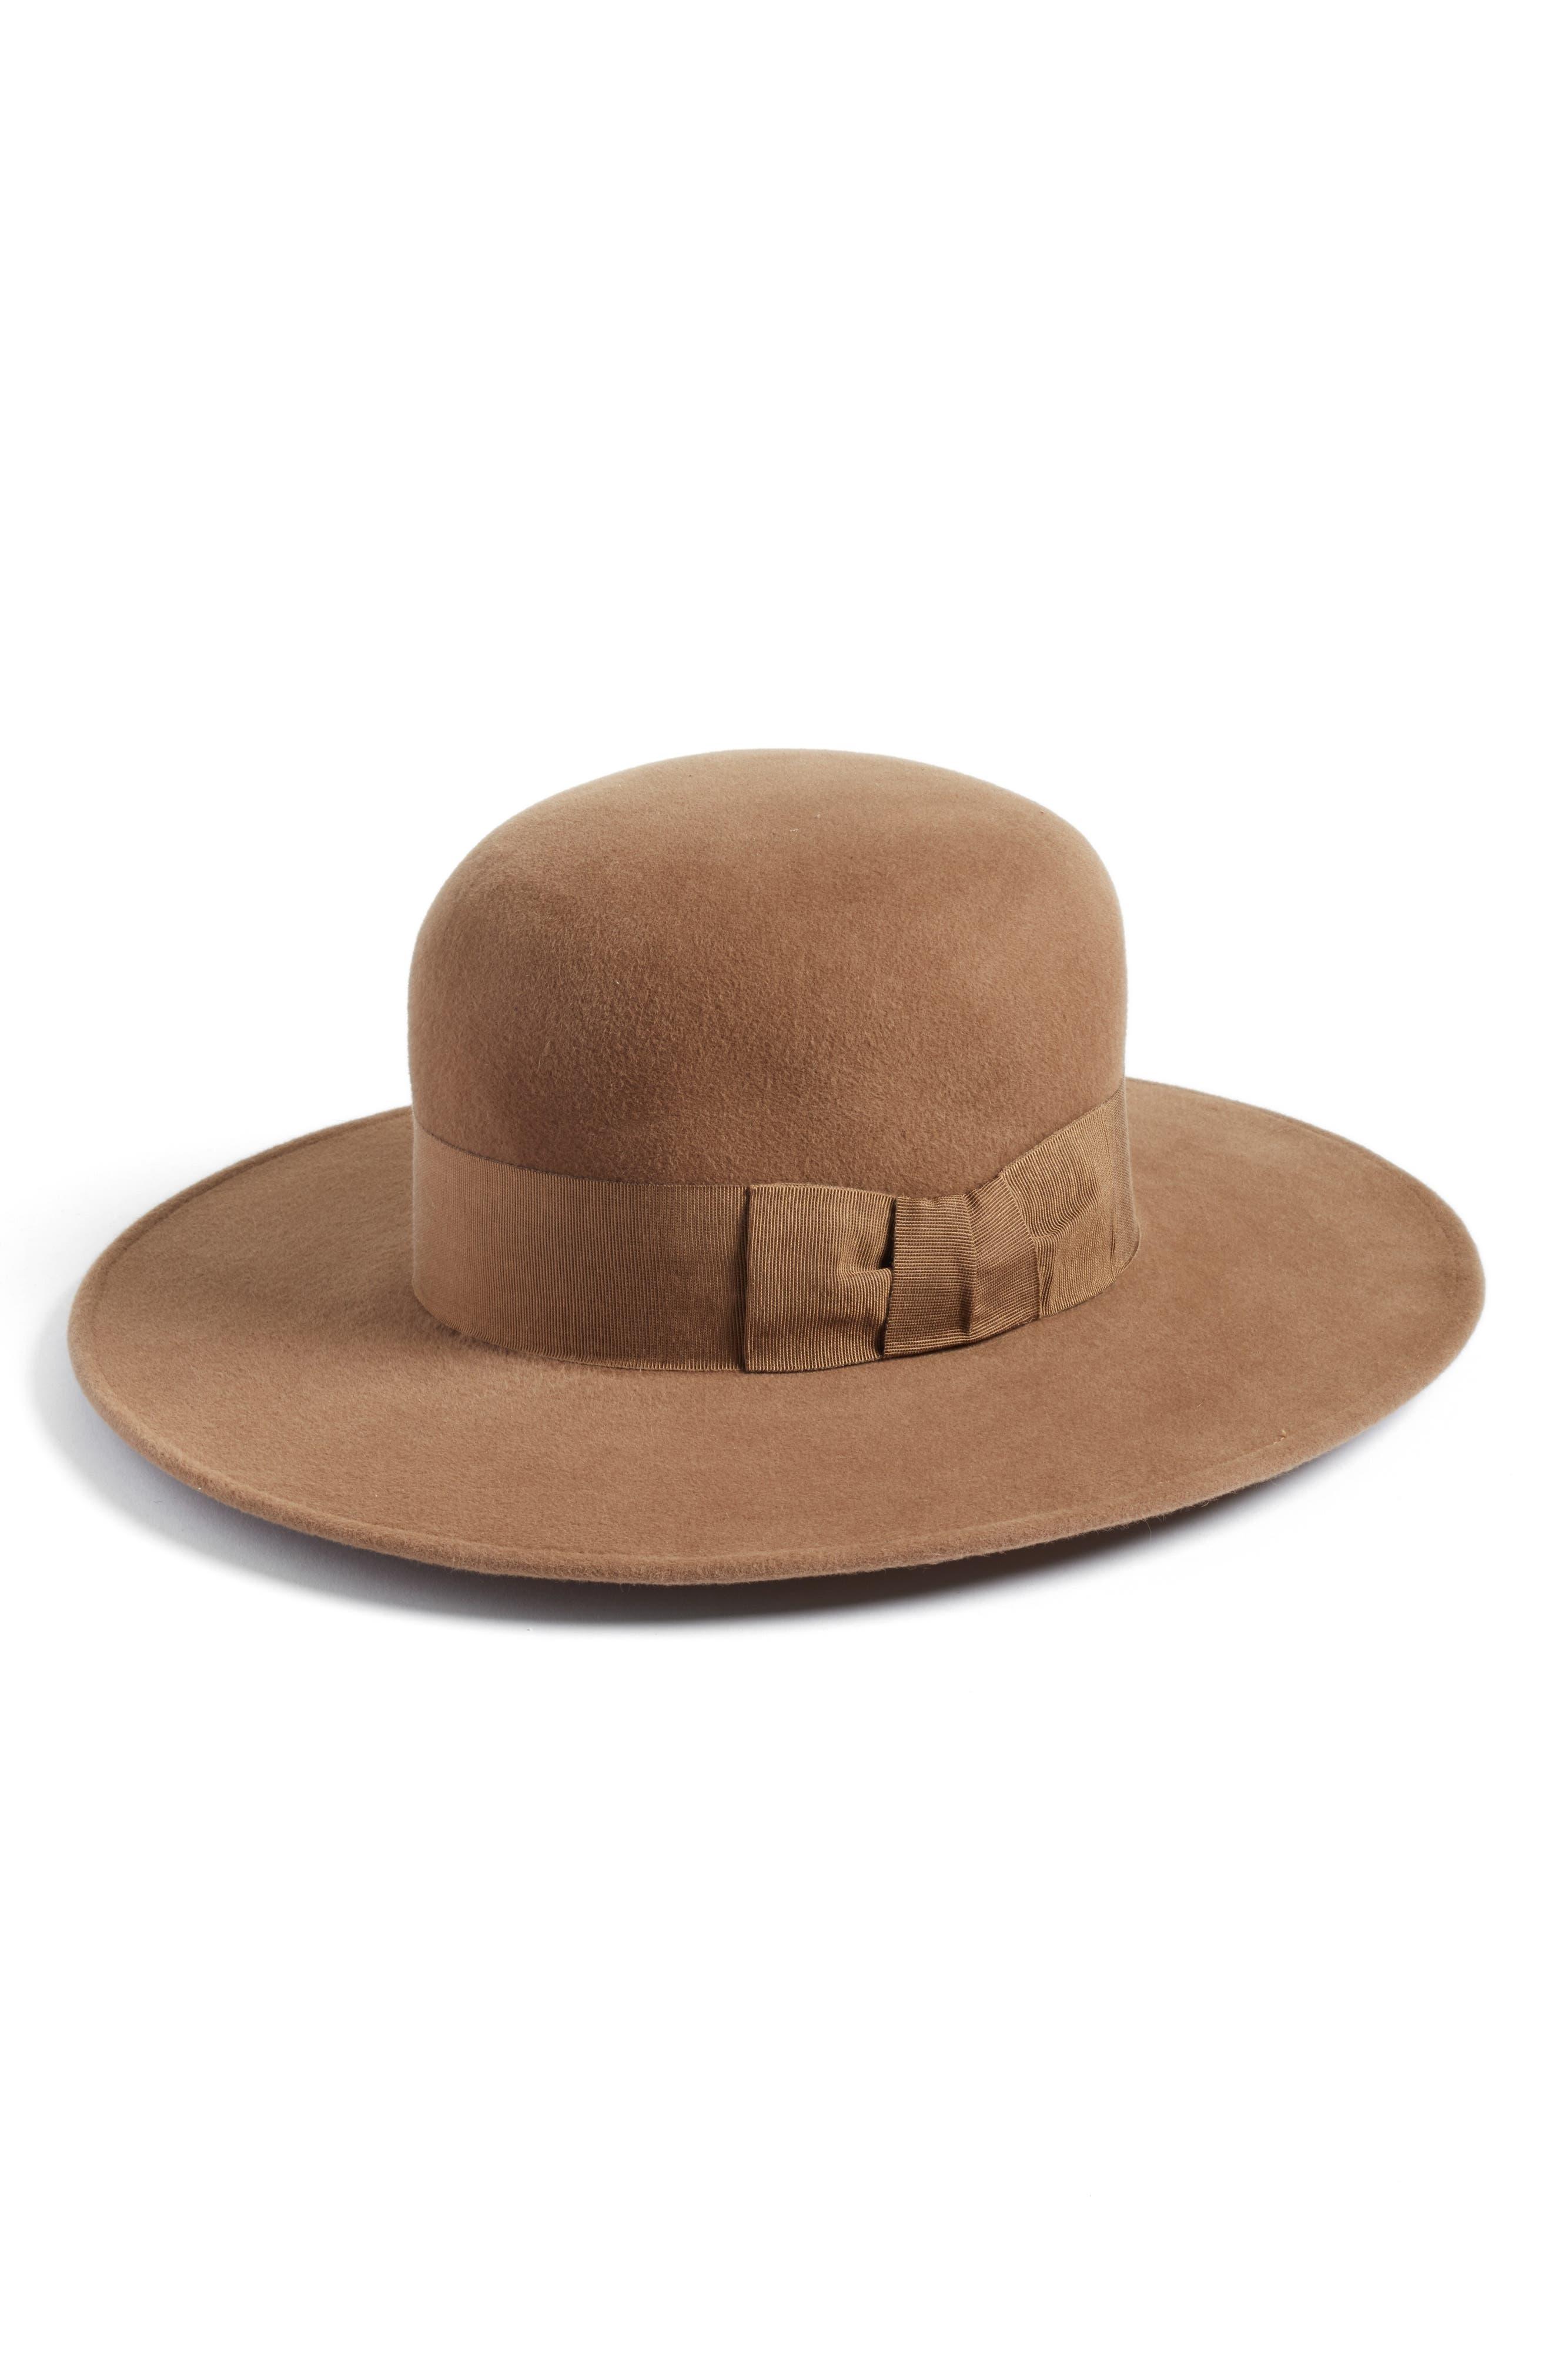 Main Image - Eric Javits Velour Padre Fur Felt Wide Brim Hat